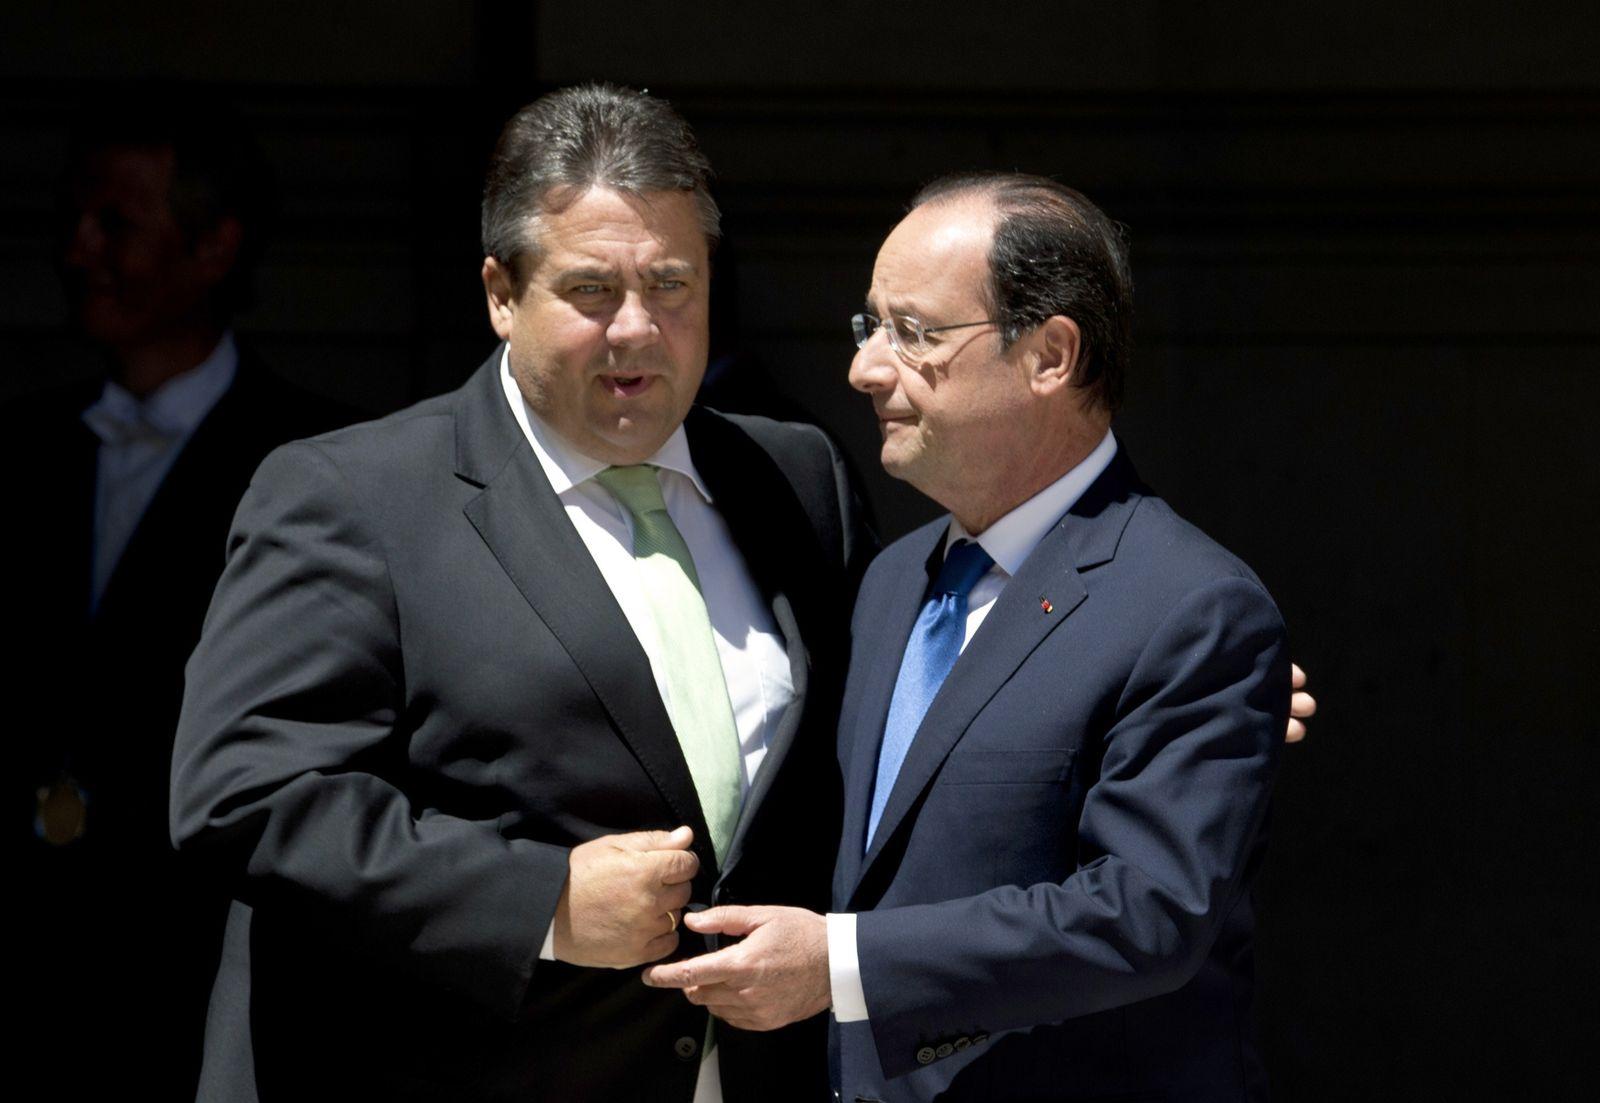 FRANCE-EU-MEETING